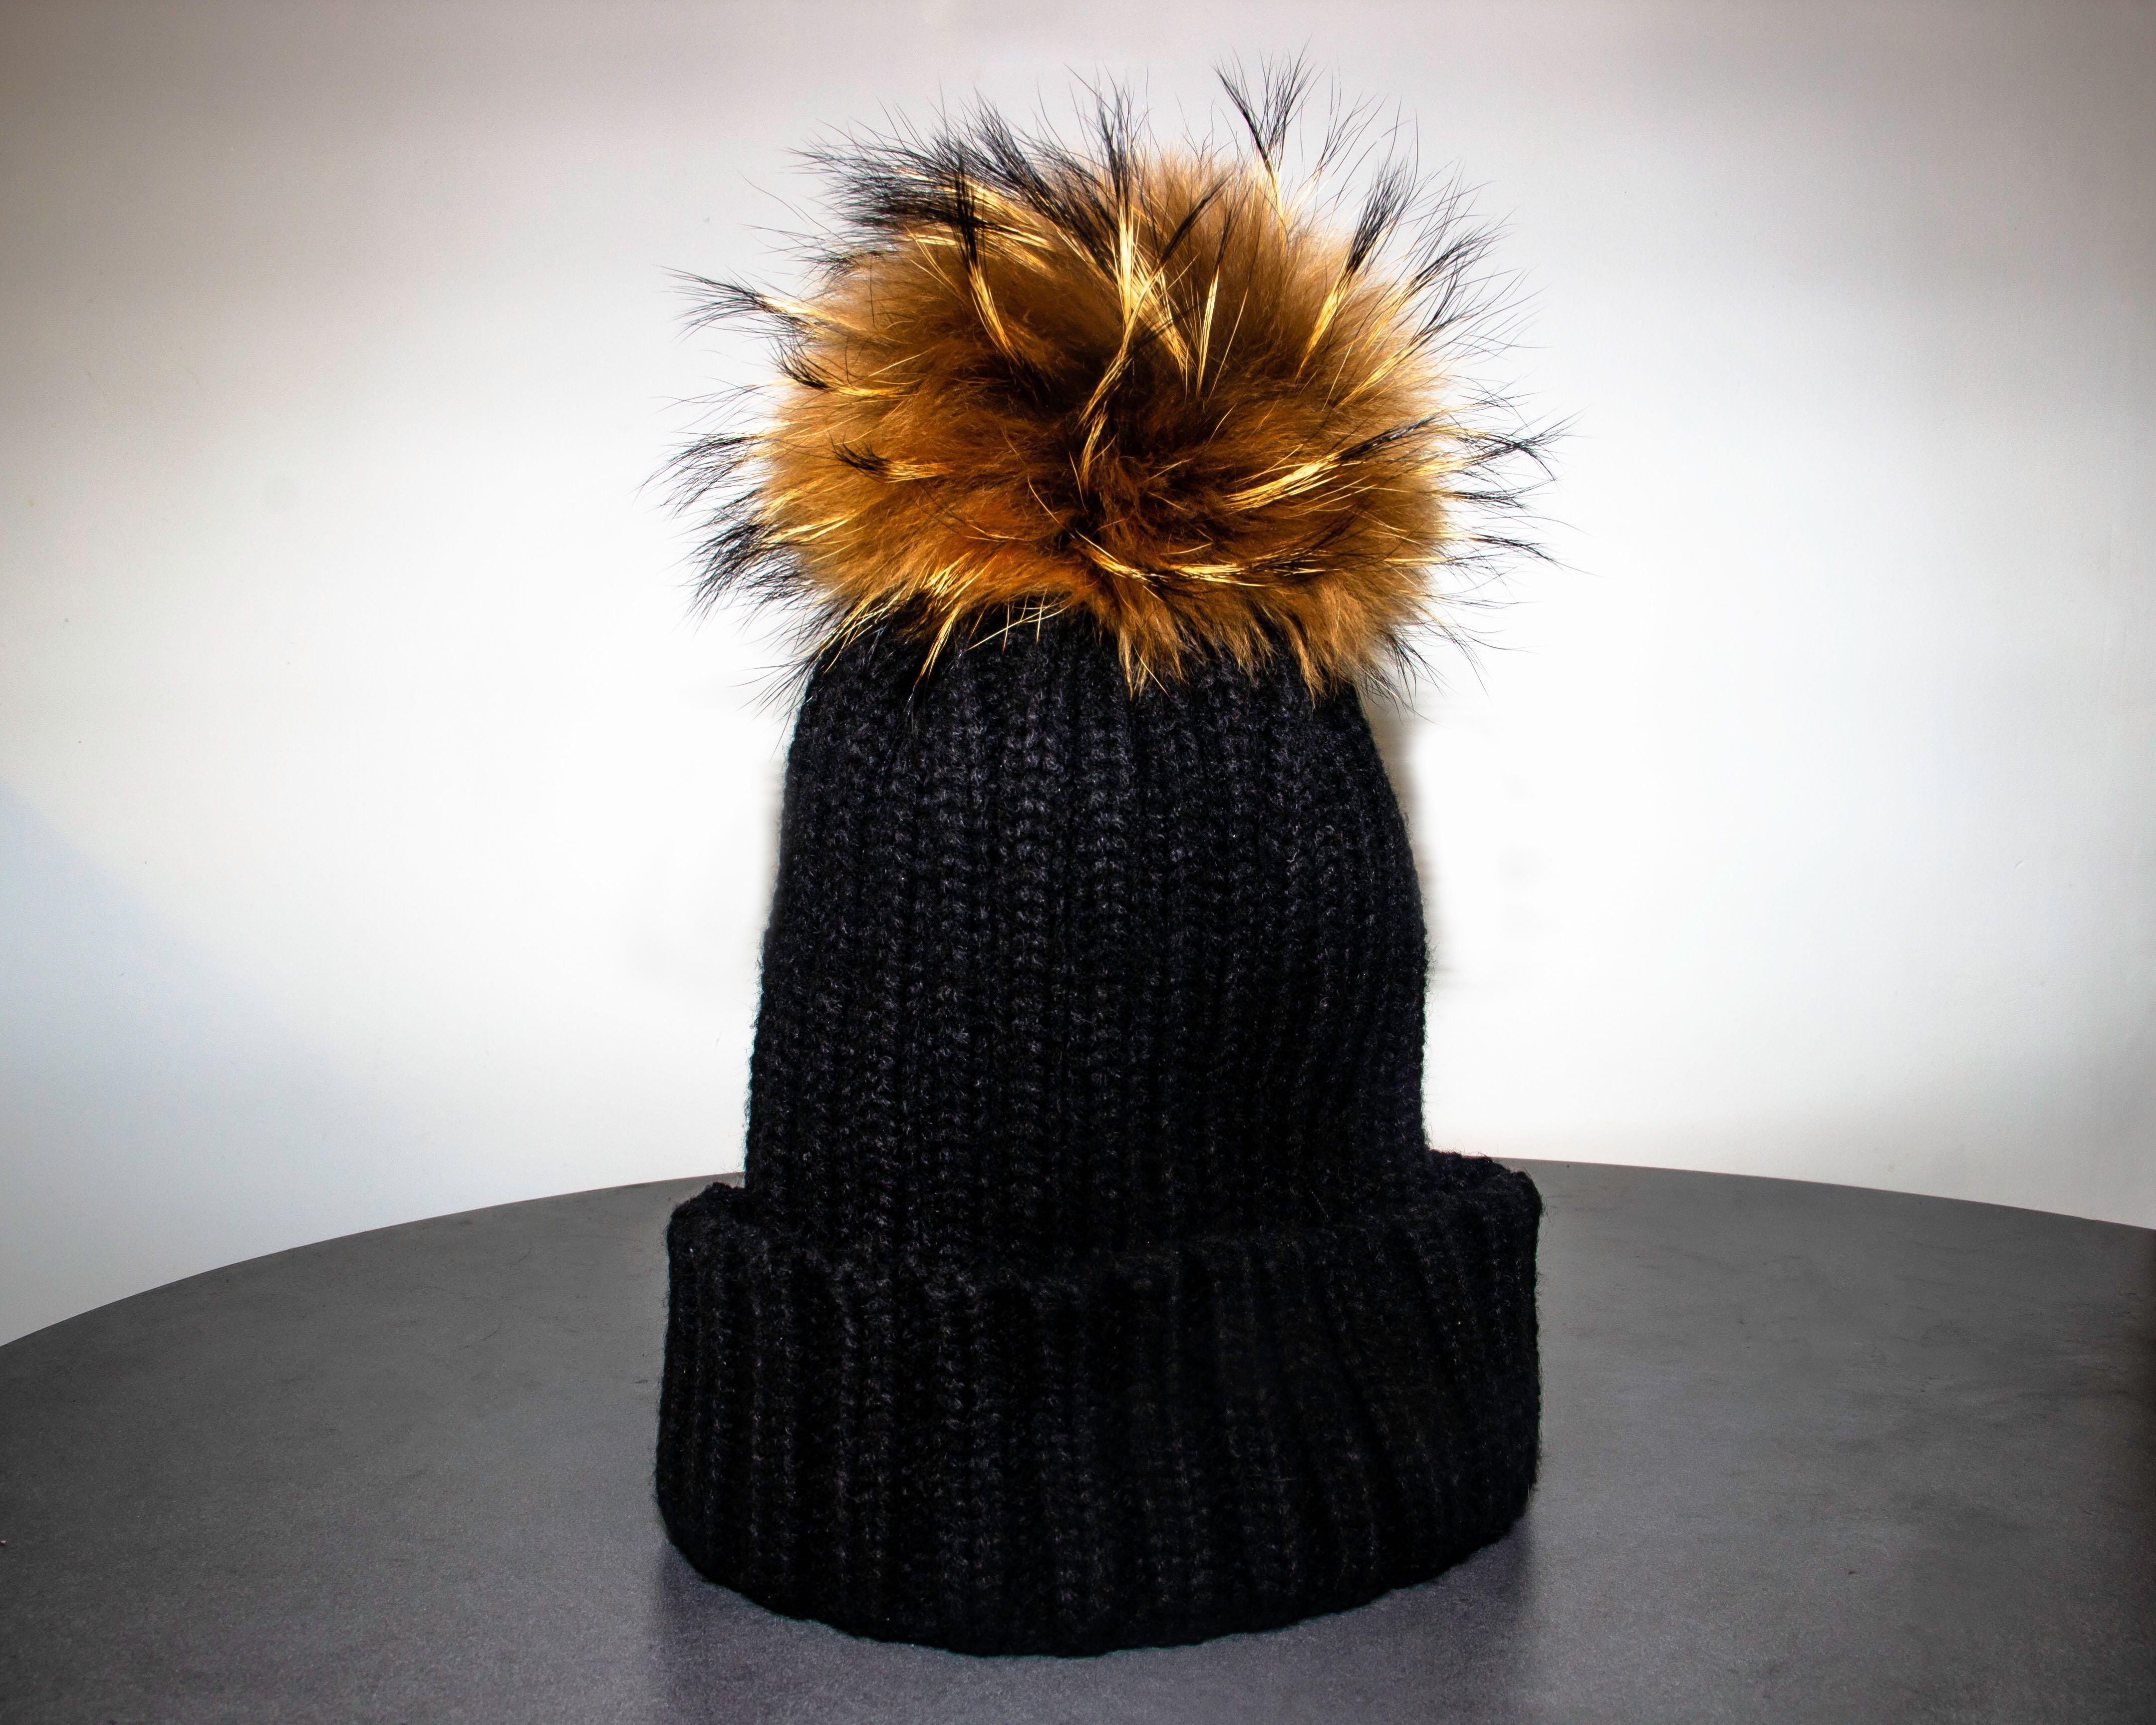 FINAL PRICE DROP! canada goose/mackage/rudsak like real fur pom pom hat